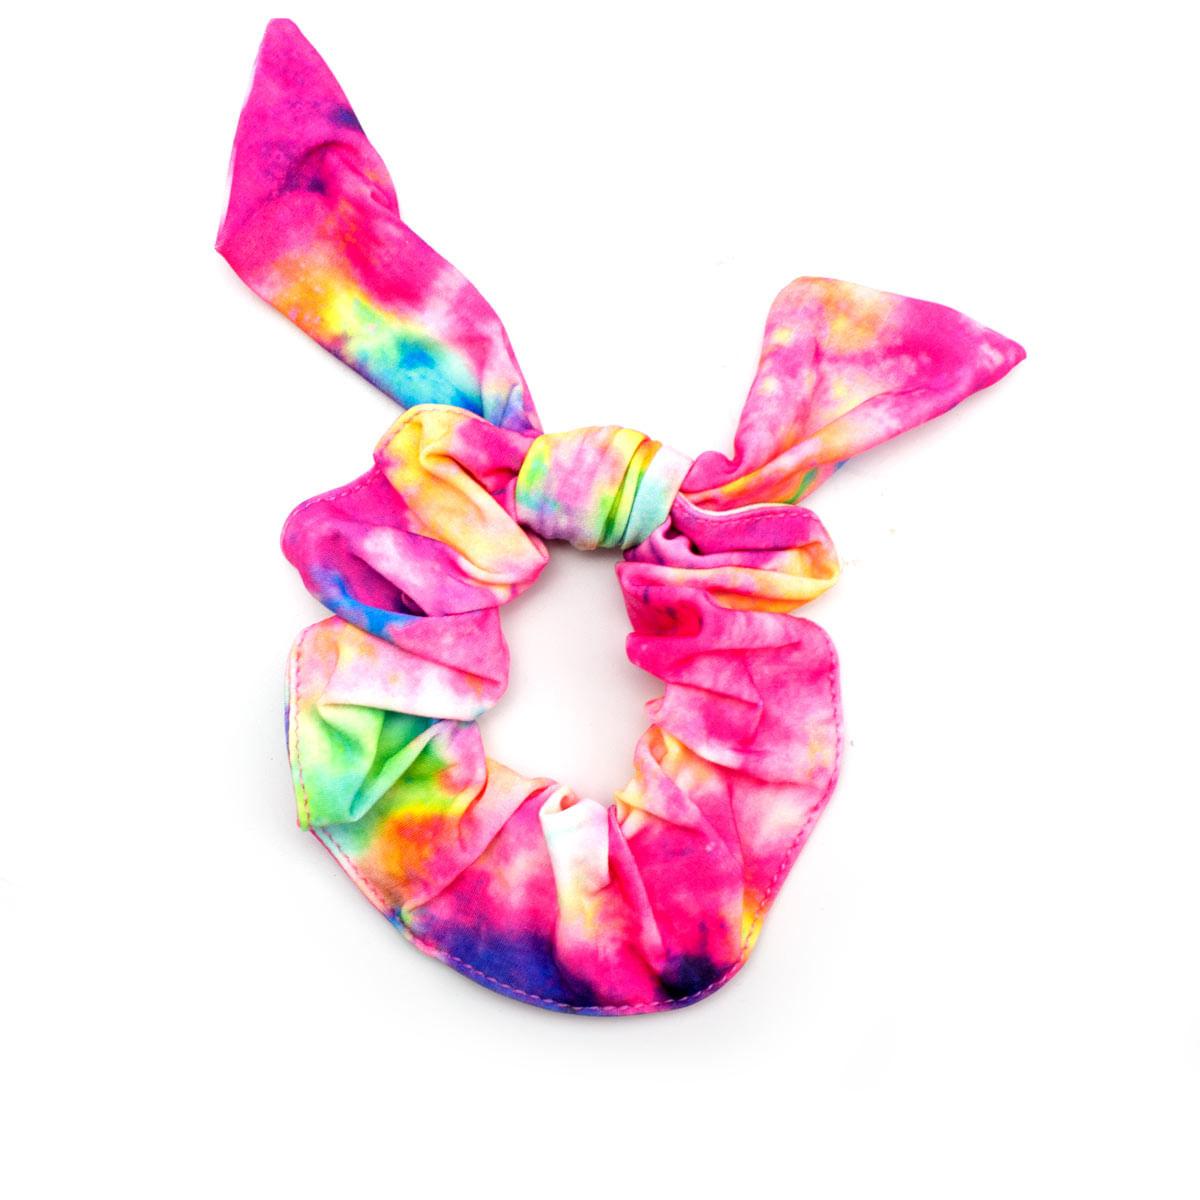 Scrunchie-Infantil-GG-Tie-Dye-Ludique-et-Badin-9069--VER21-